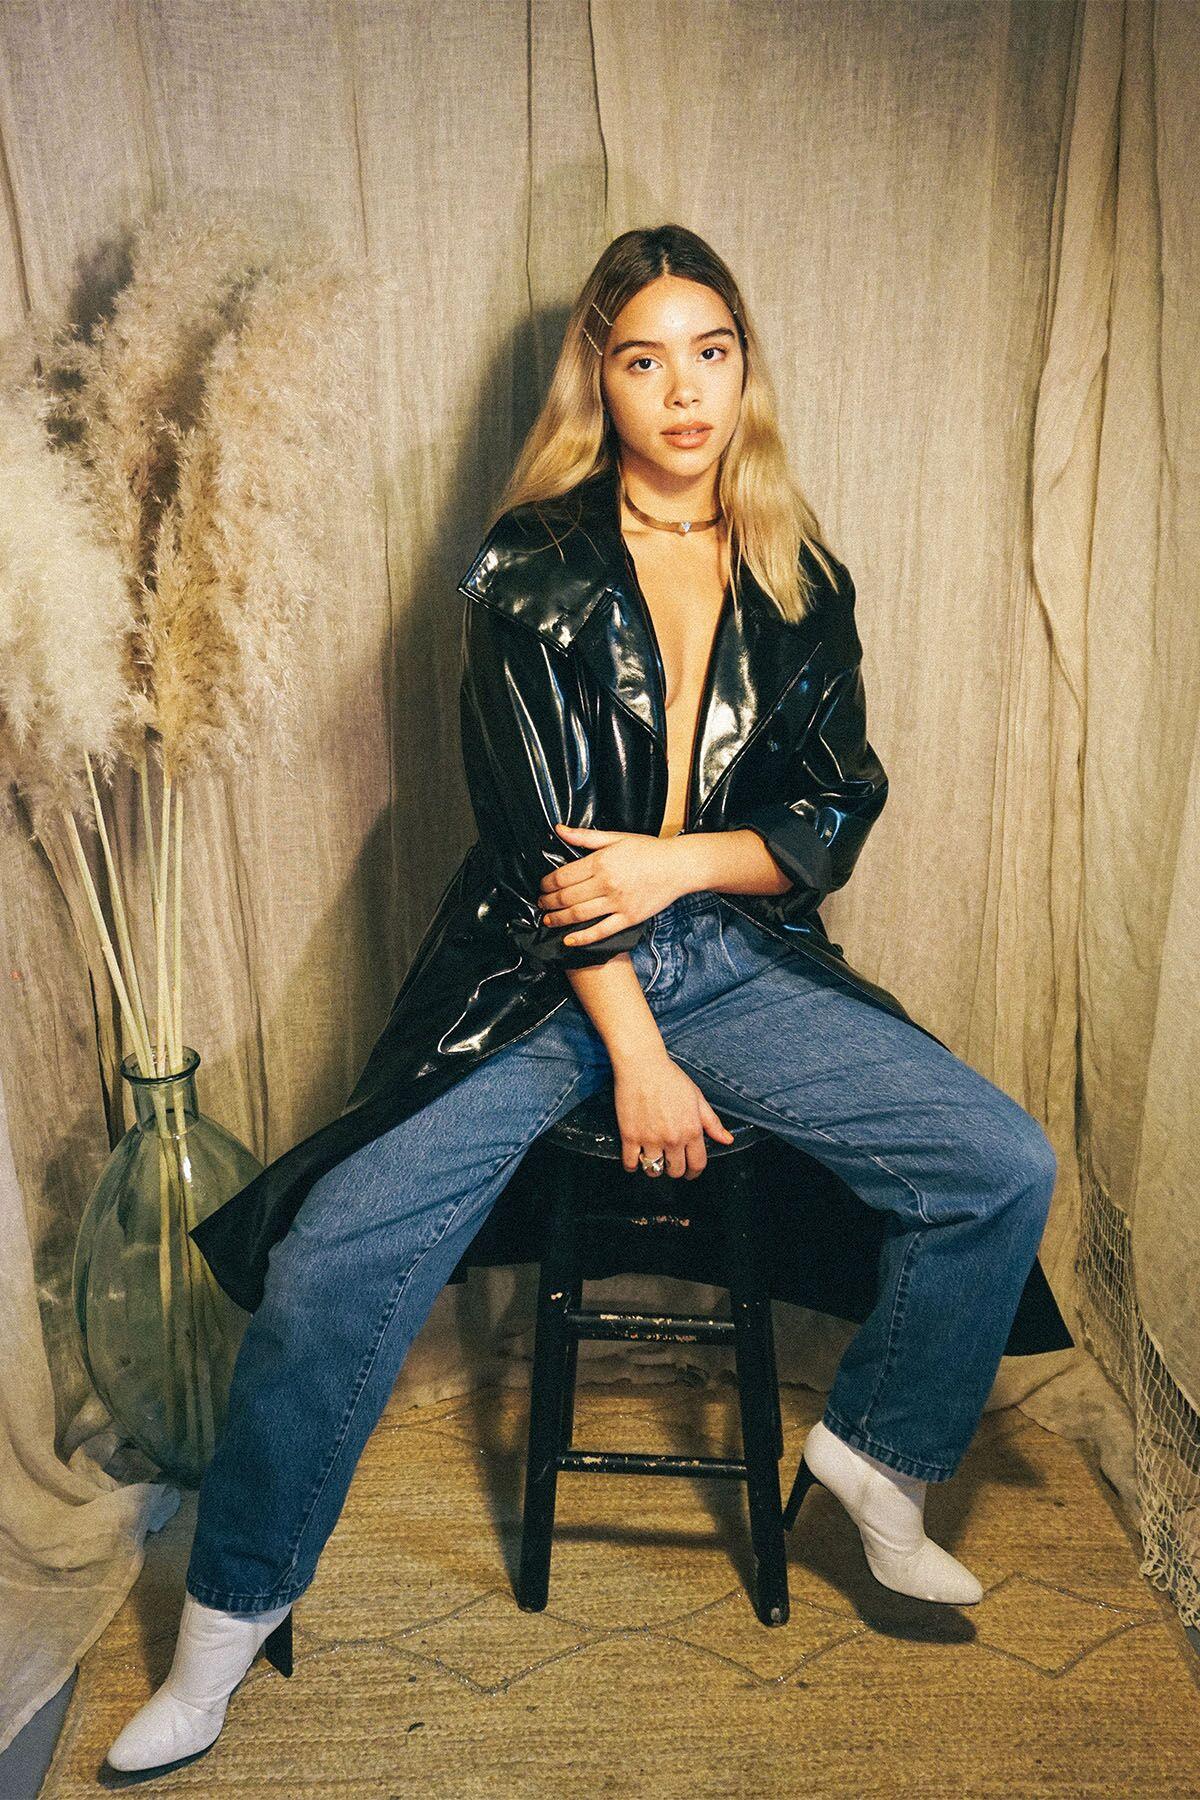 Jacket: Modishriot, Jewelry: Nina Rios